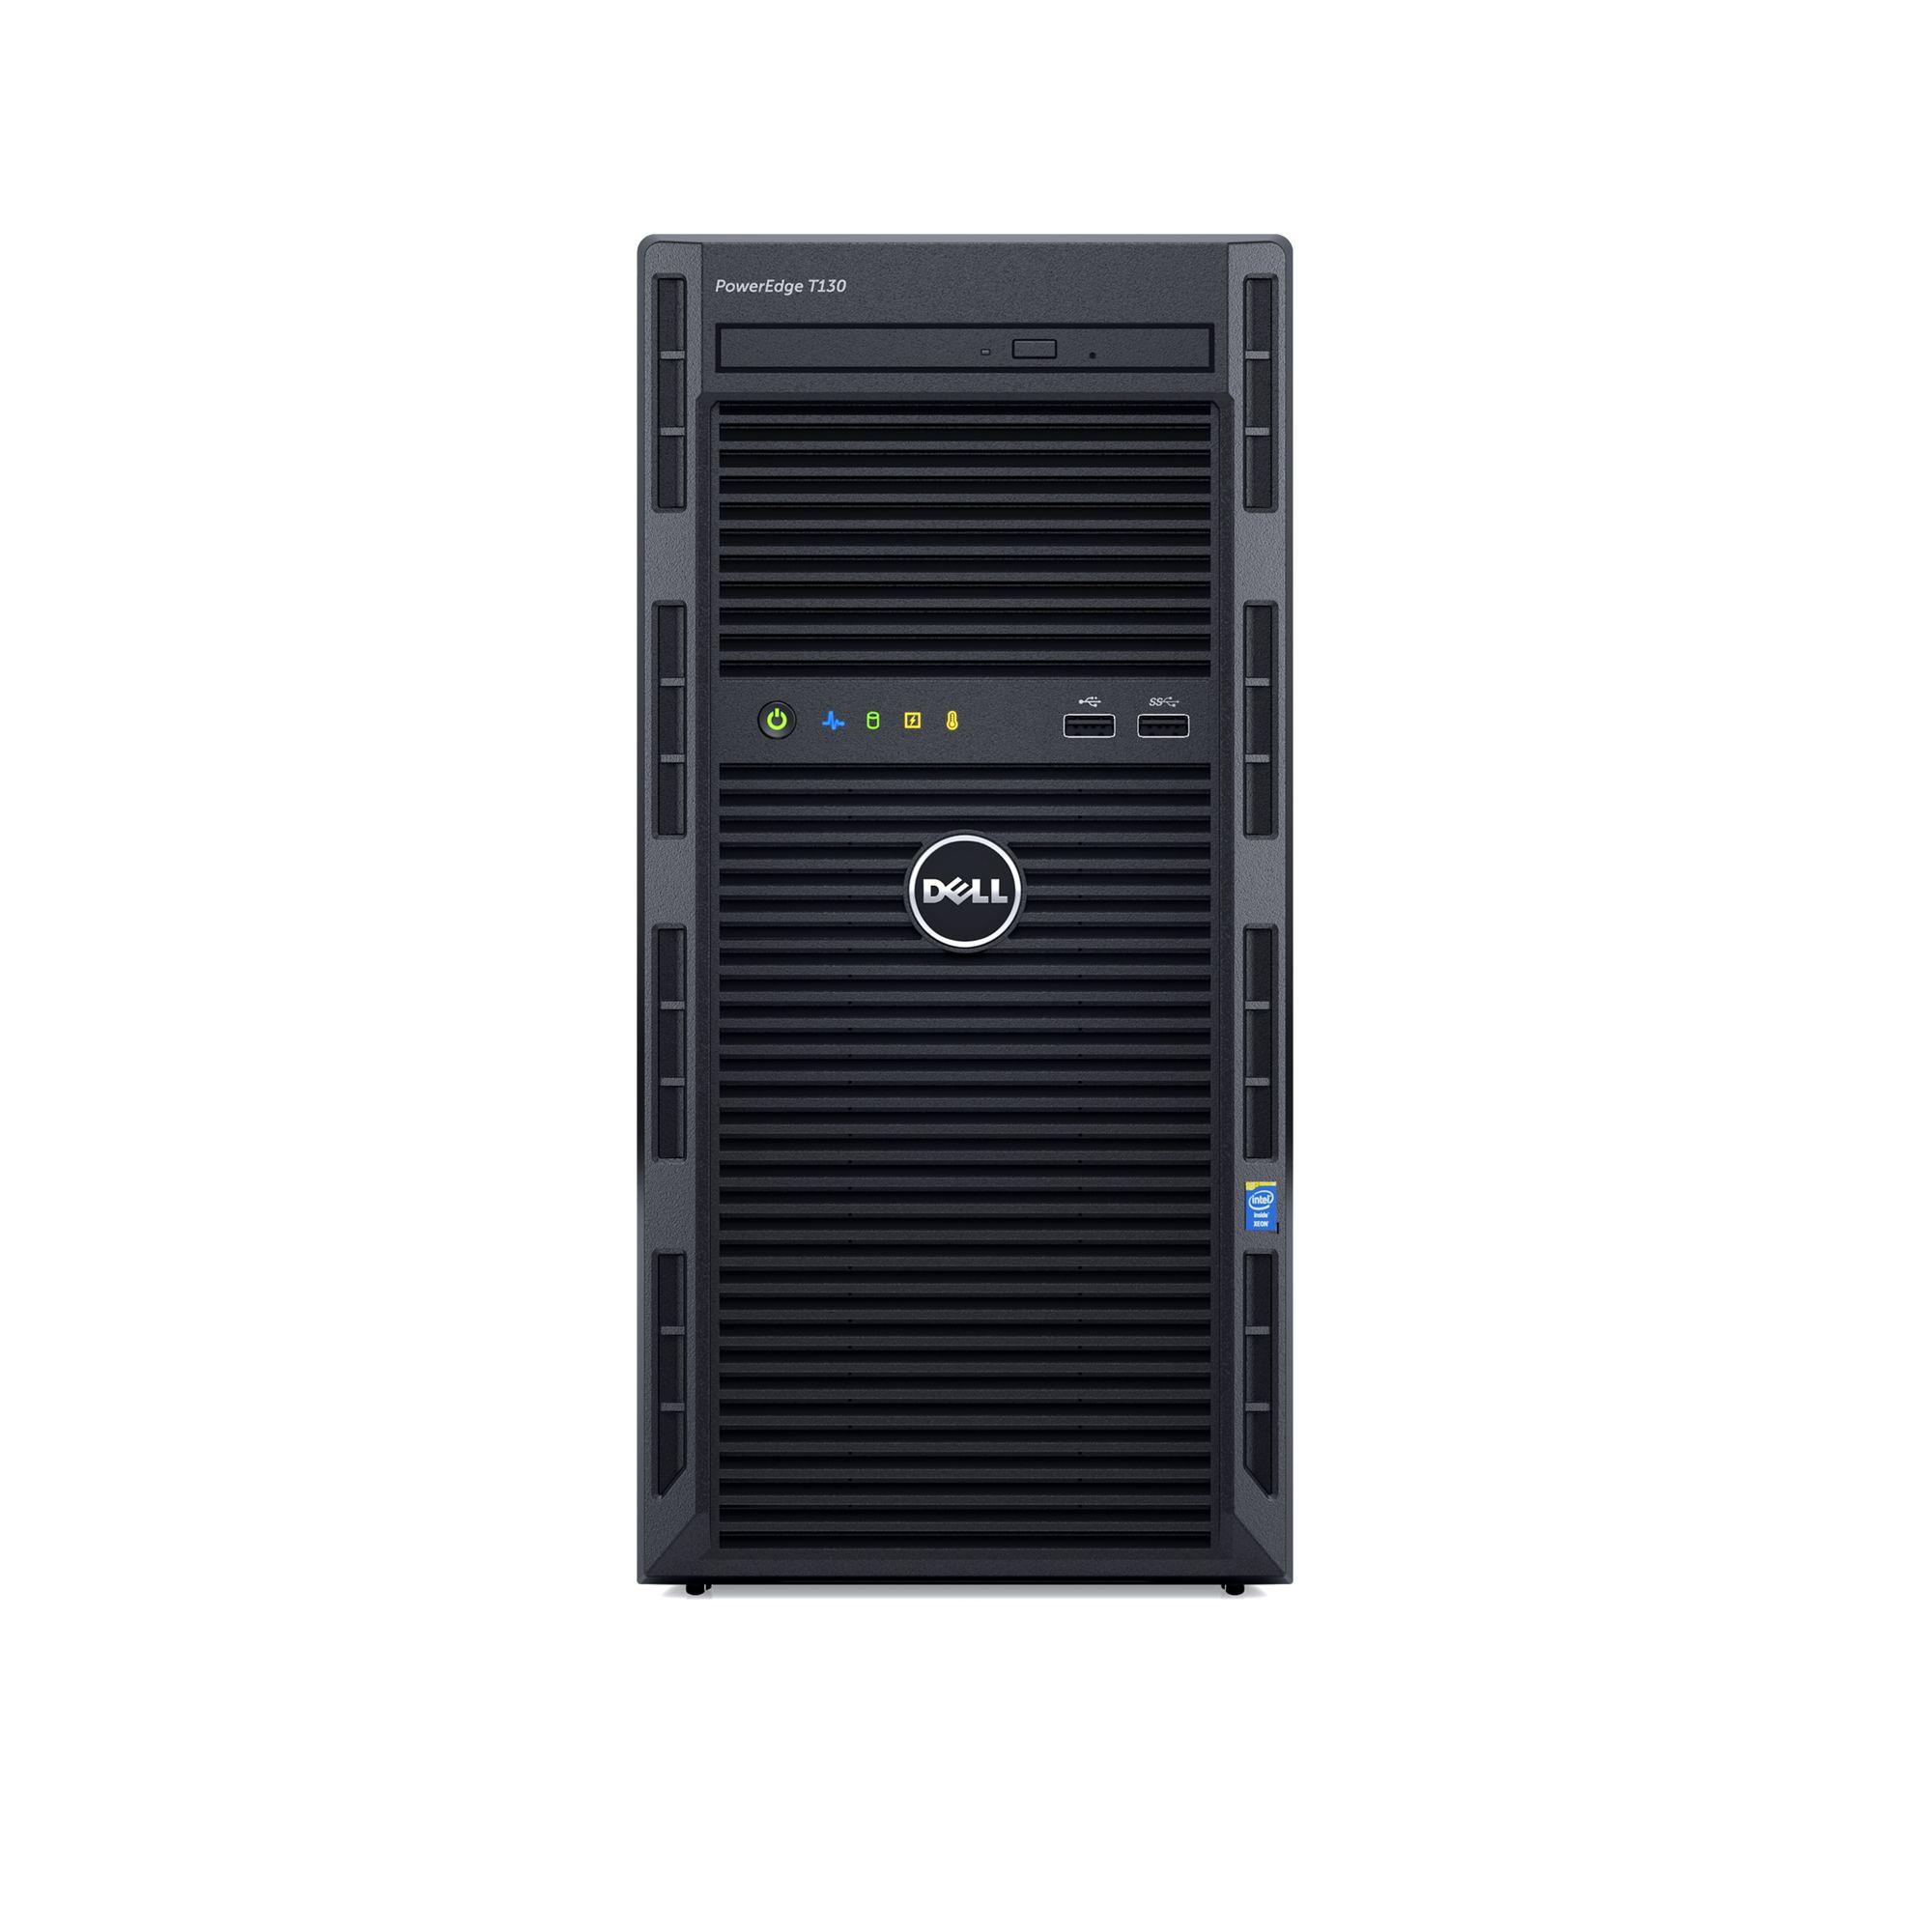 servidor torre